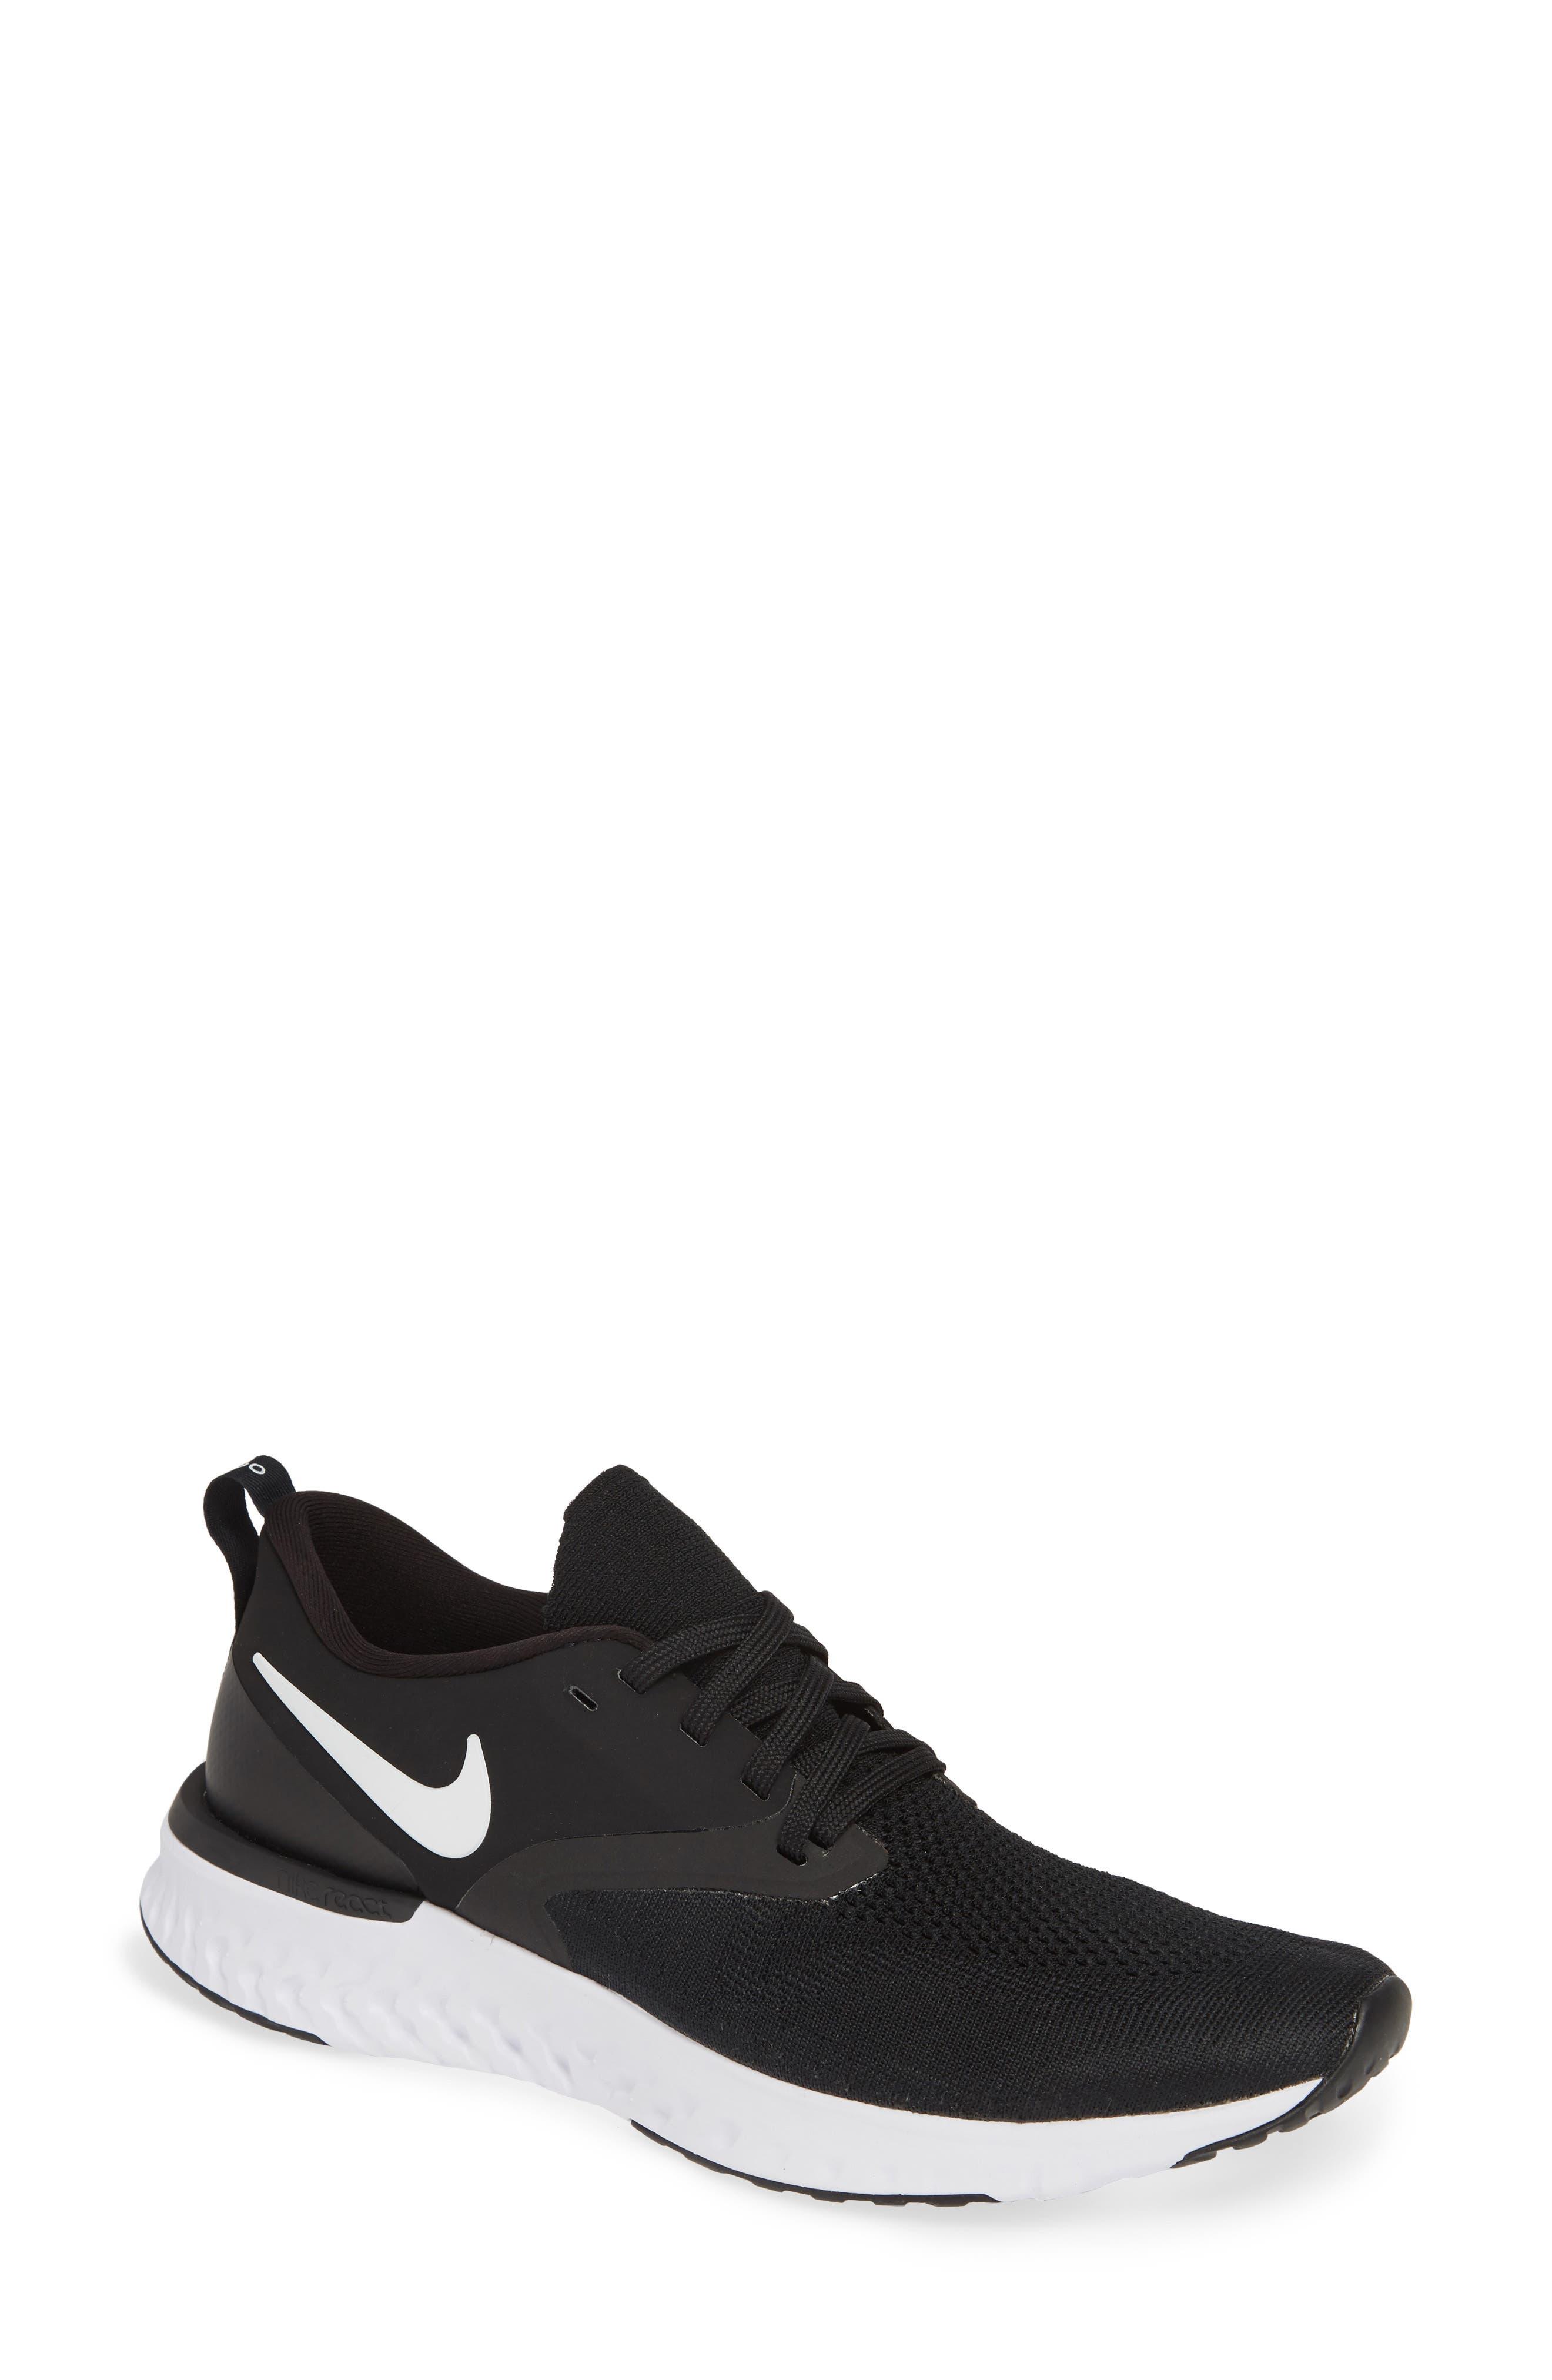 NIKE Odyssey React 2 Flyknit Running Shoe, Main, color, BLACK/ WHITE